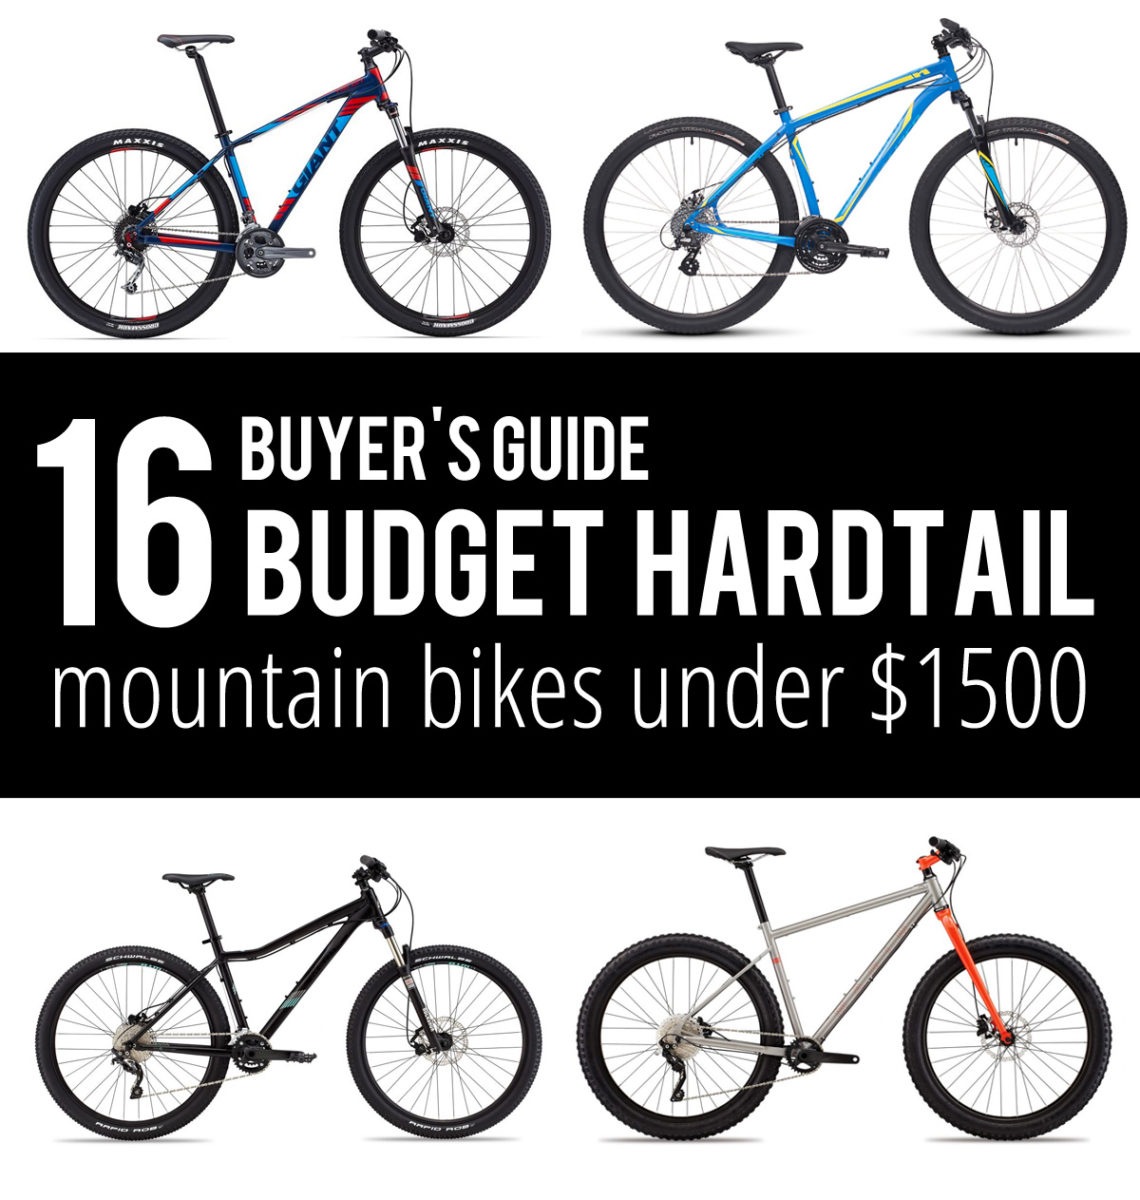 16_budget_hardtails